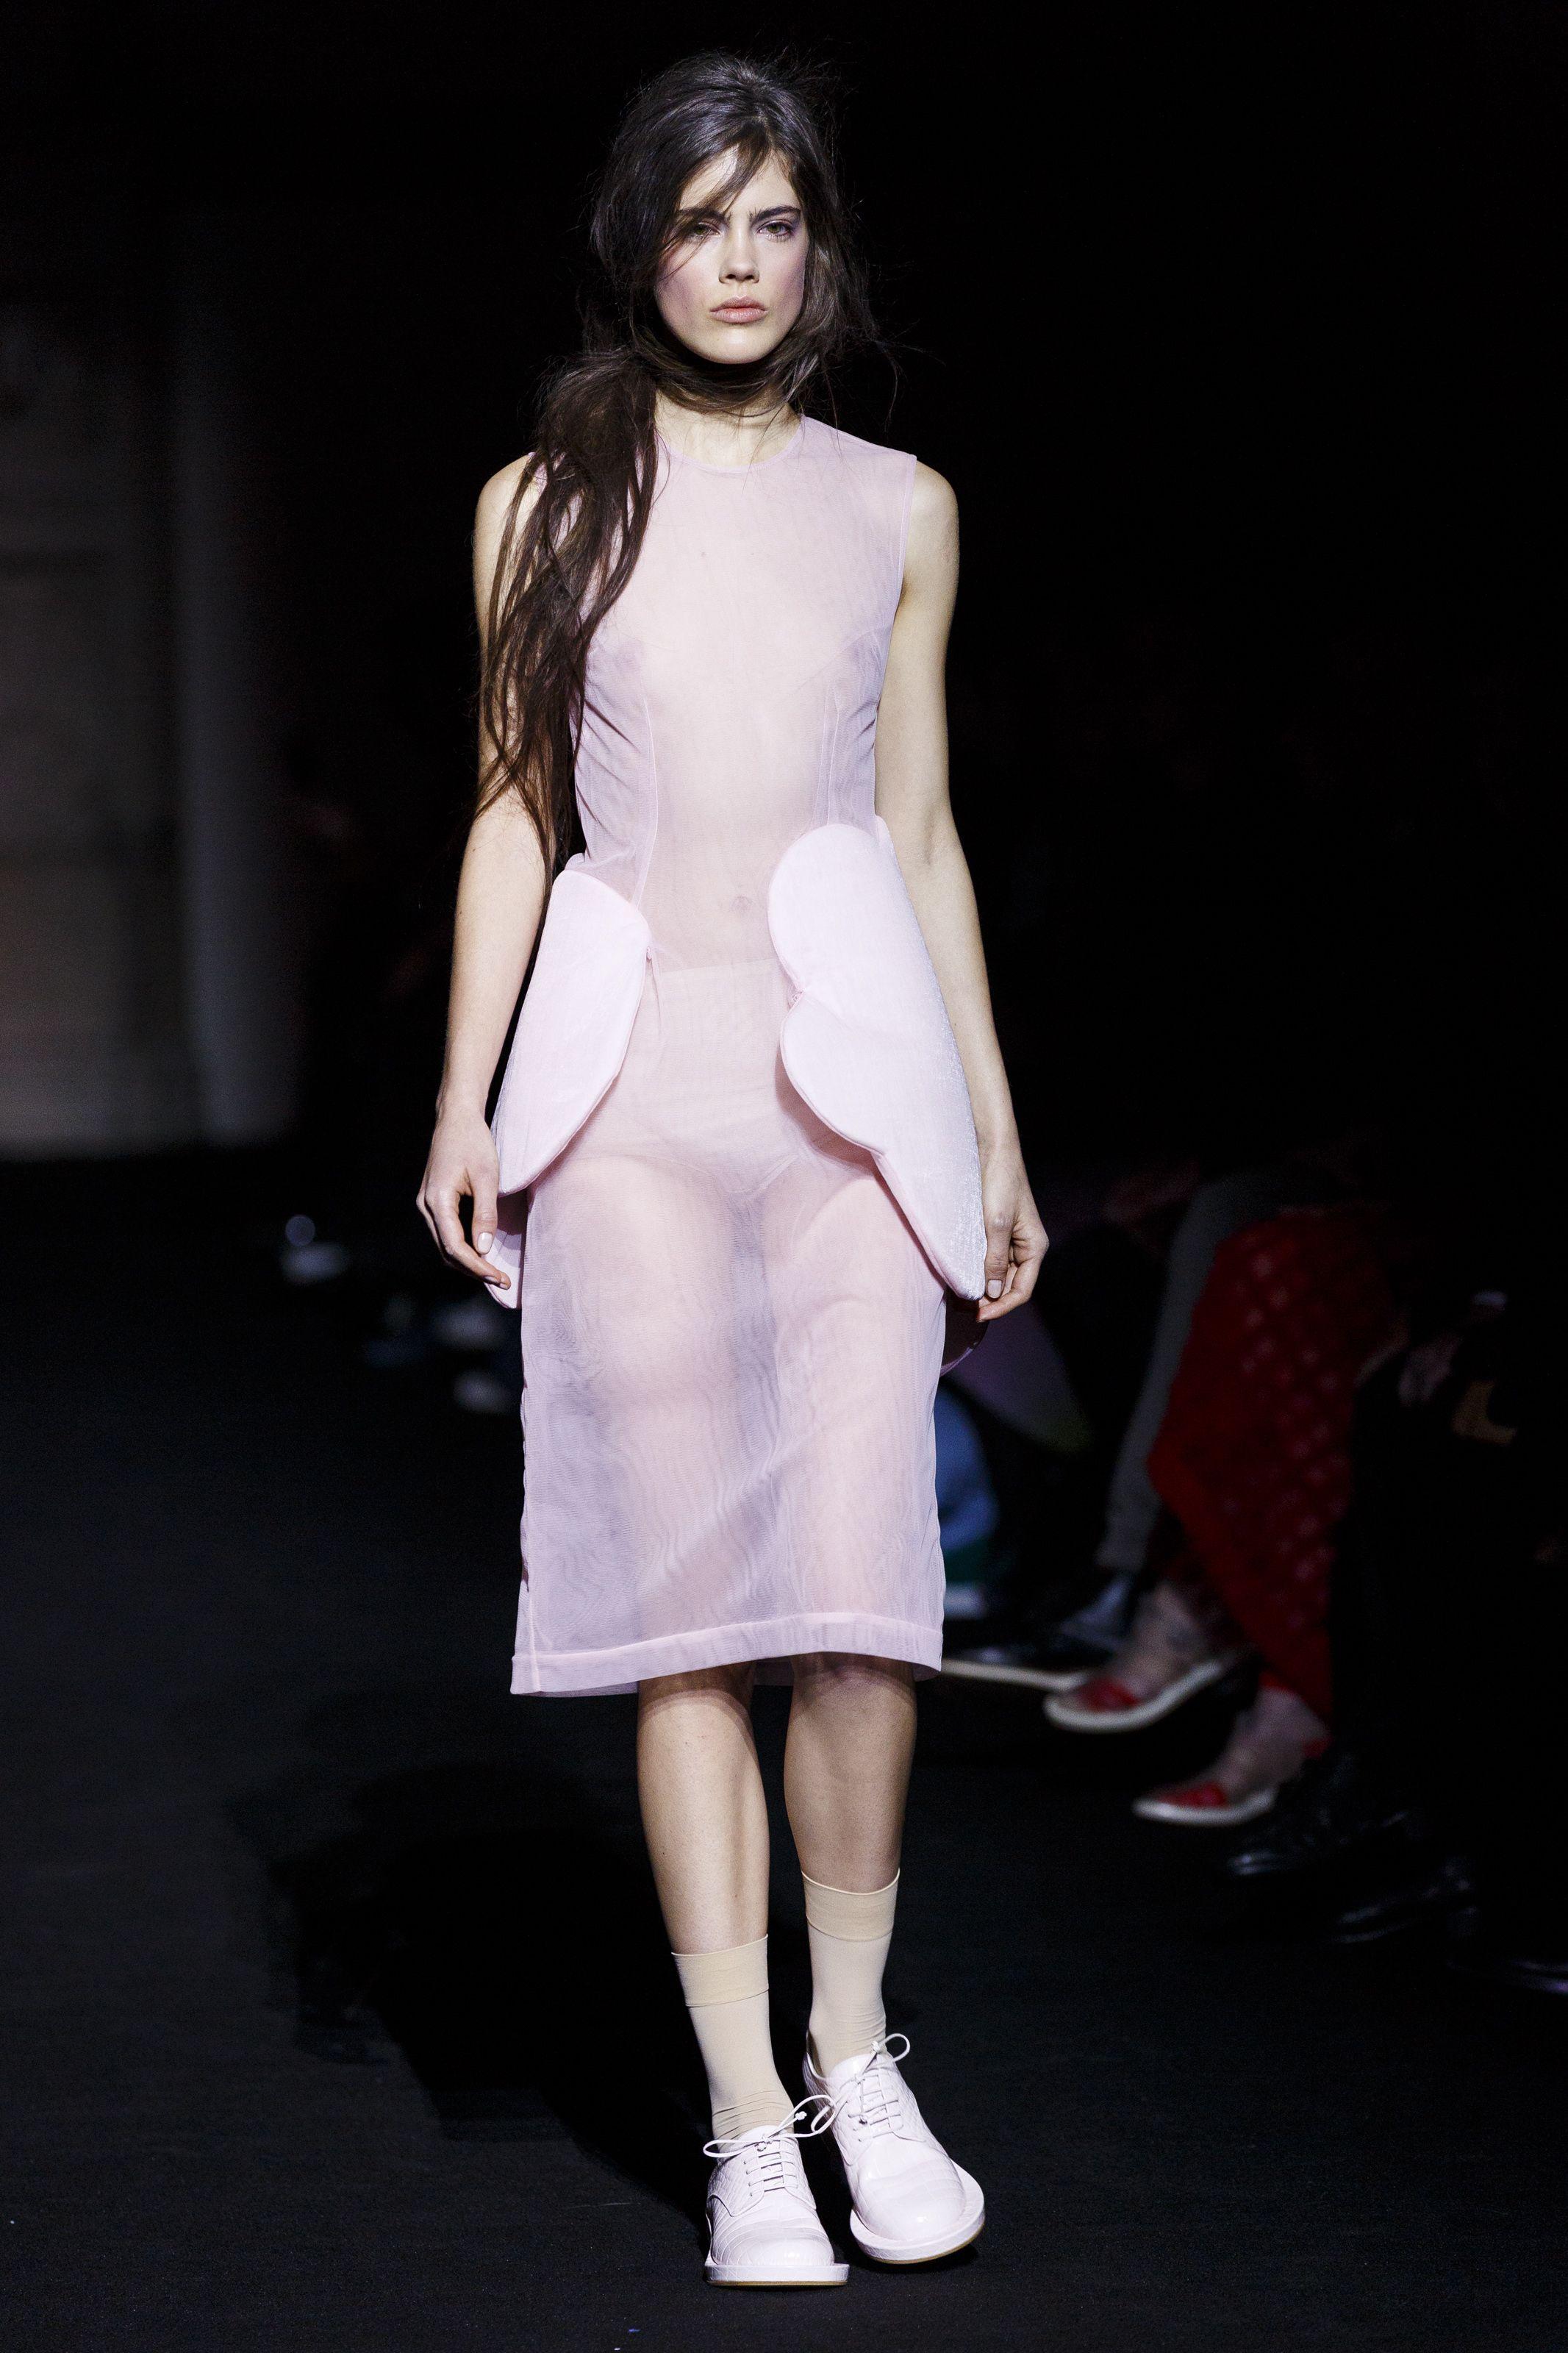 Fashion runway models nude